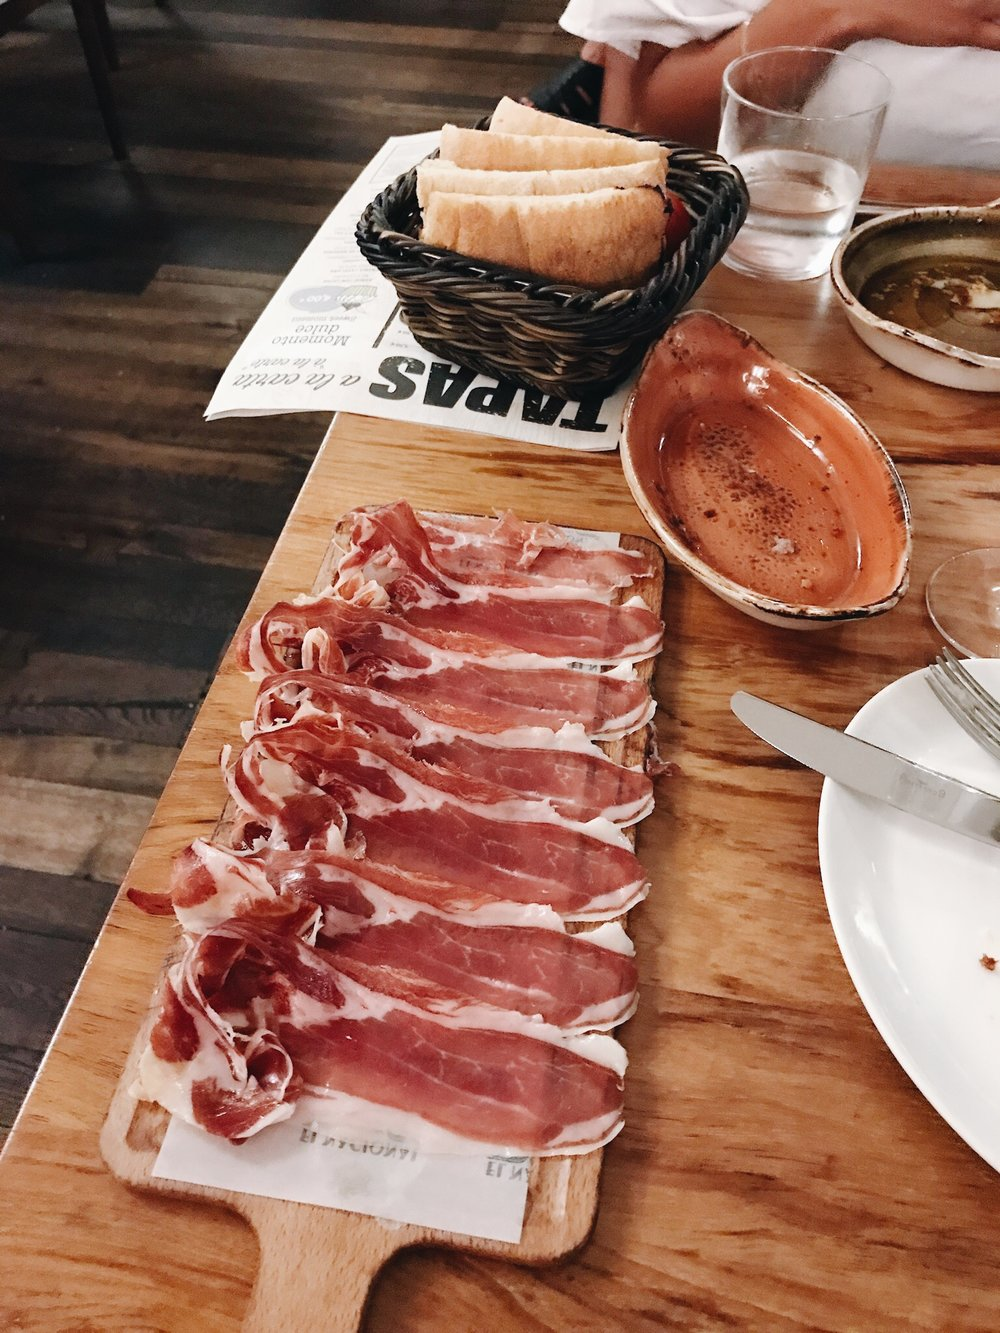 Where to eat in Spain: Iberian Ham at El Nacional in Barcelona